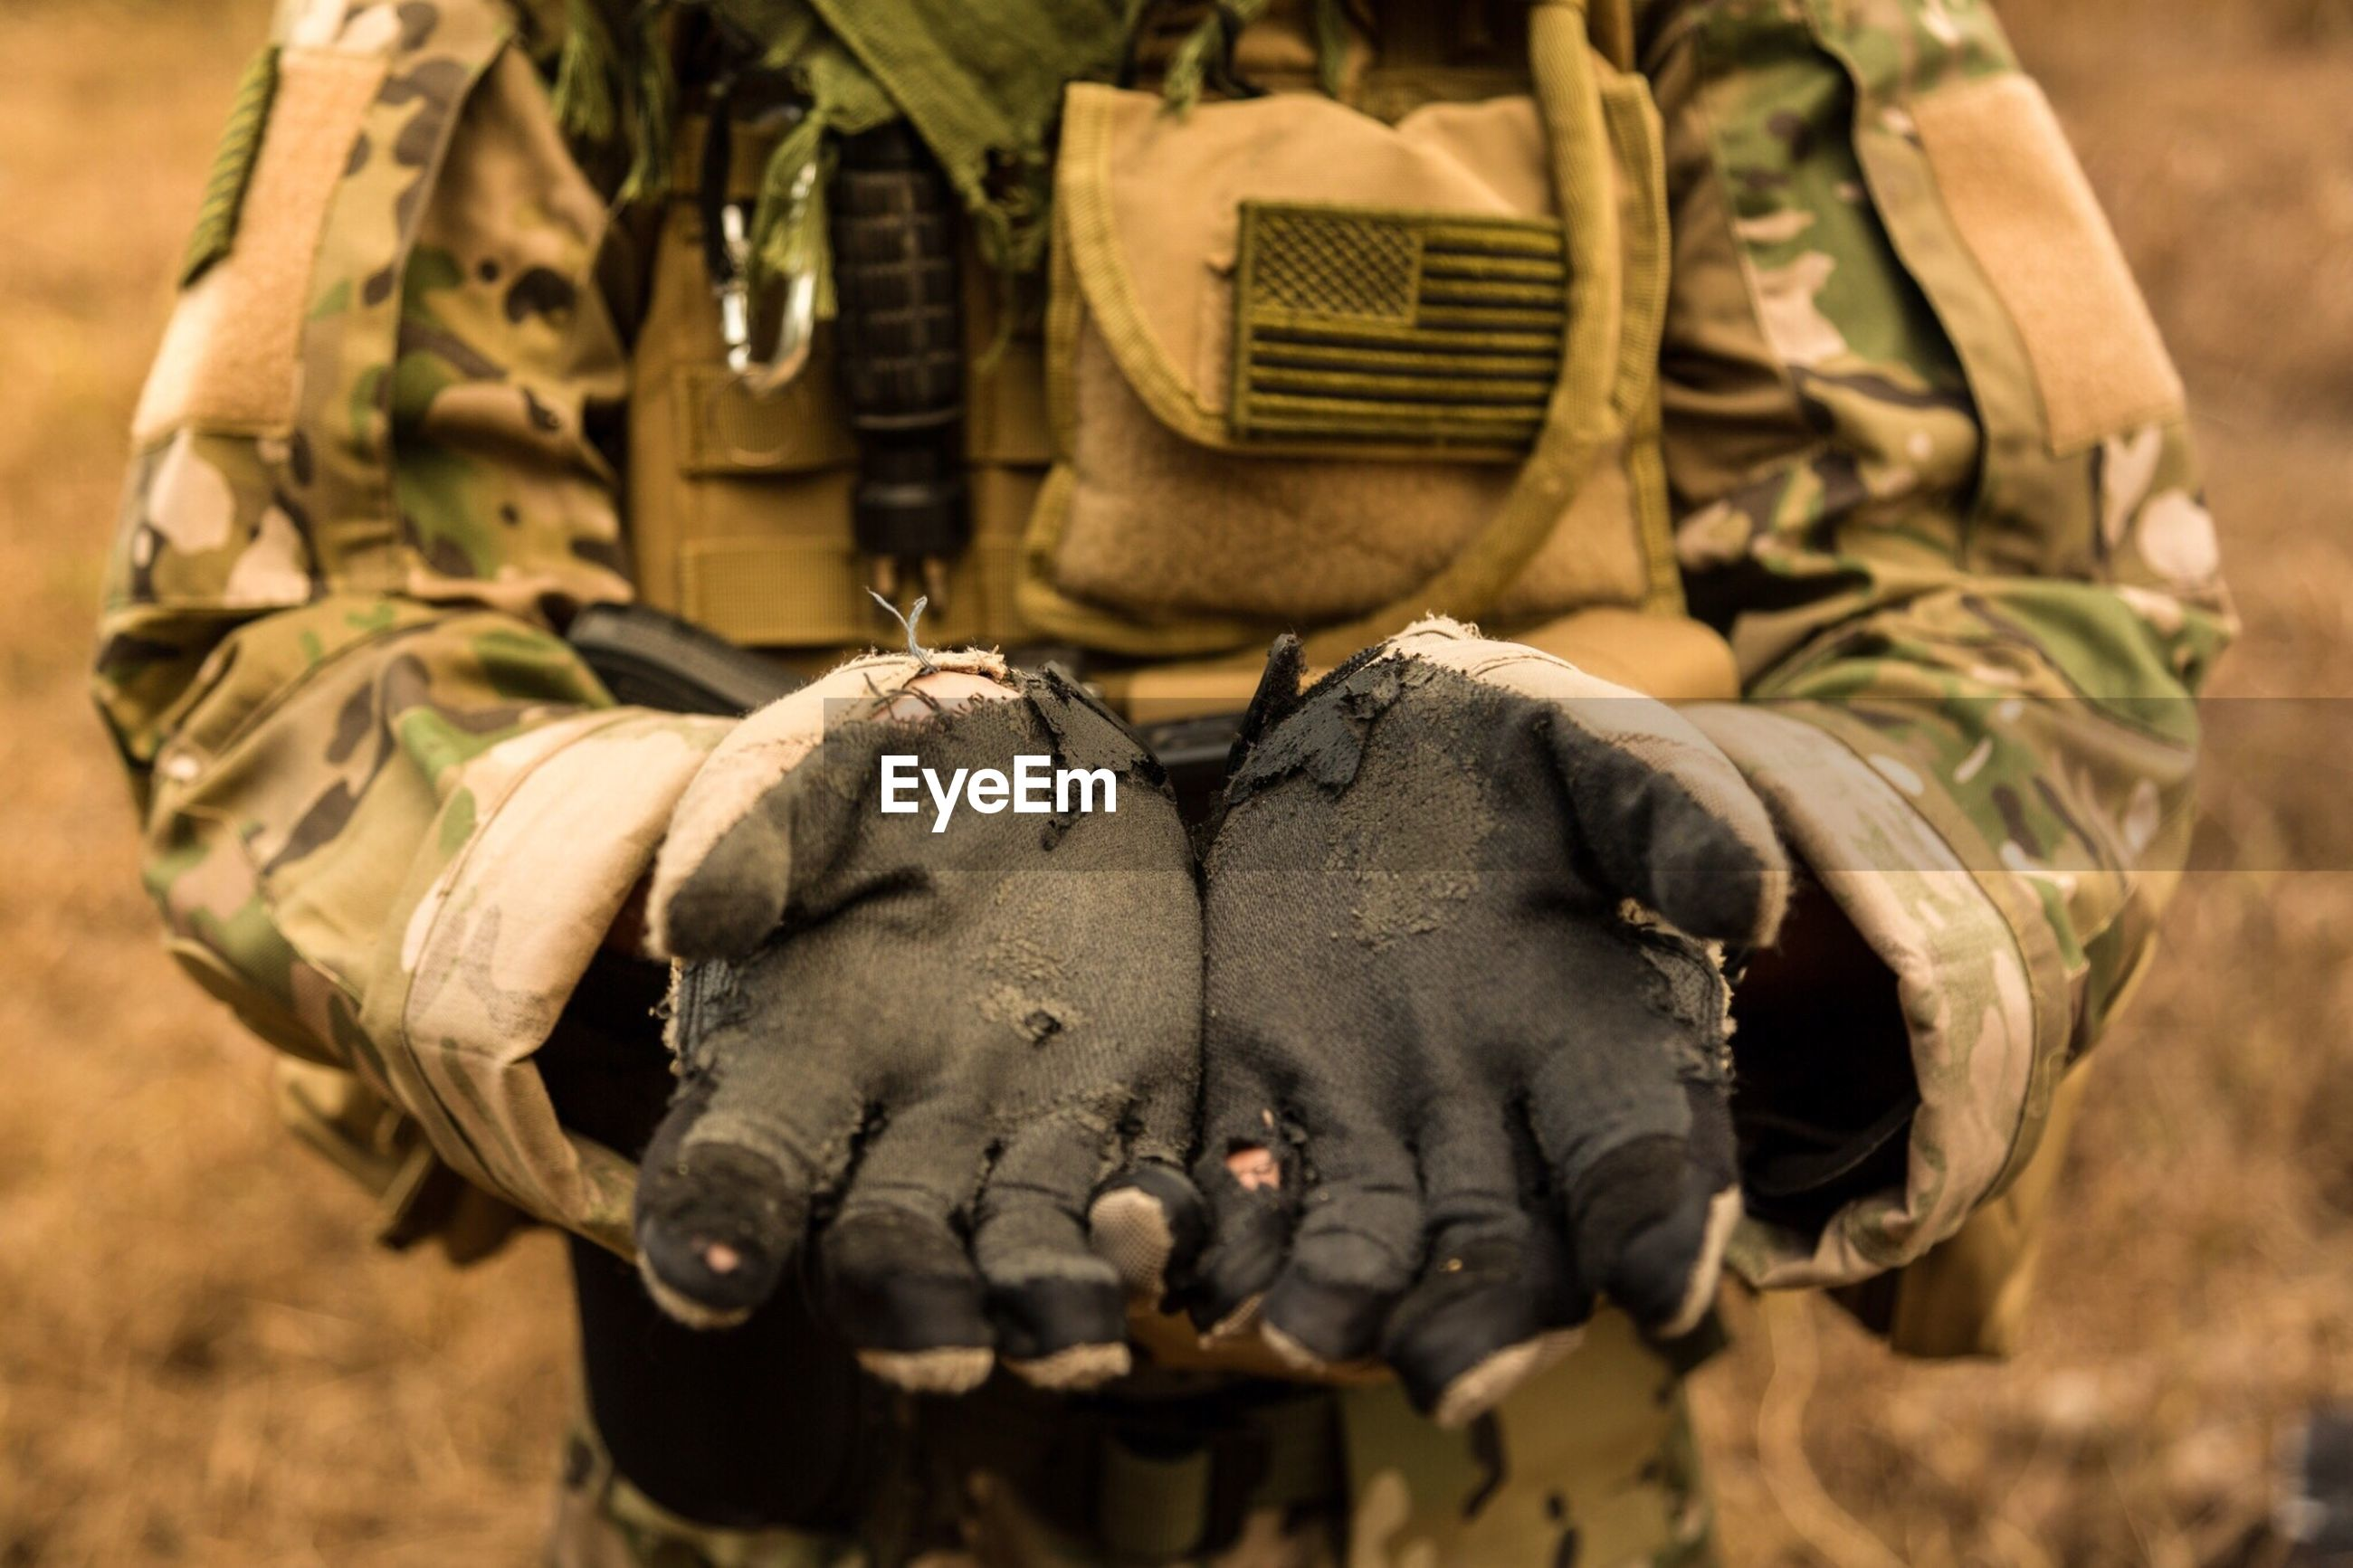 Man wearing camouflage clothing